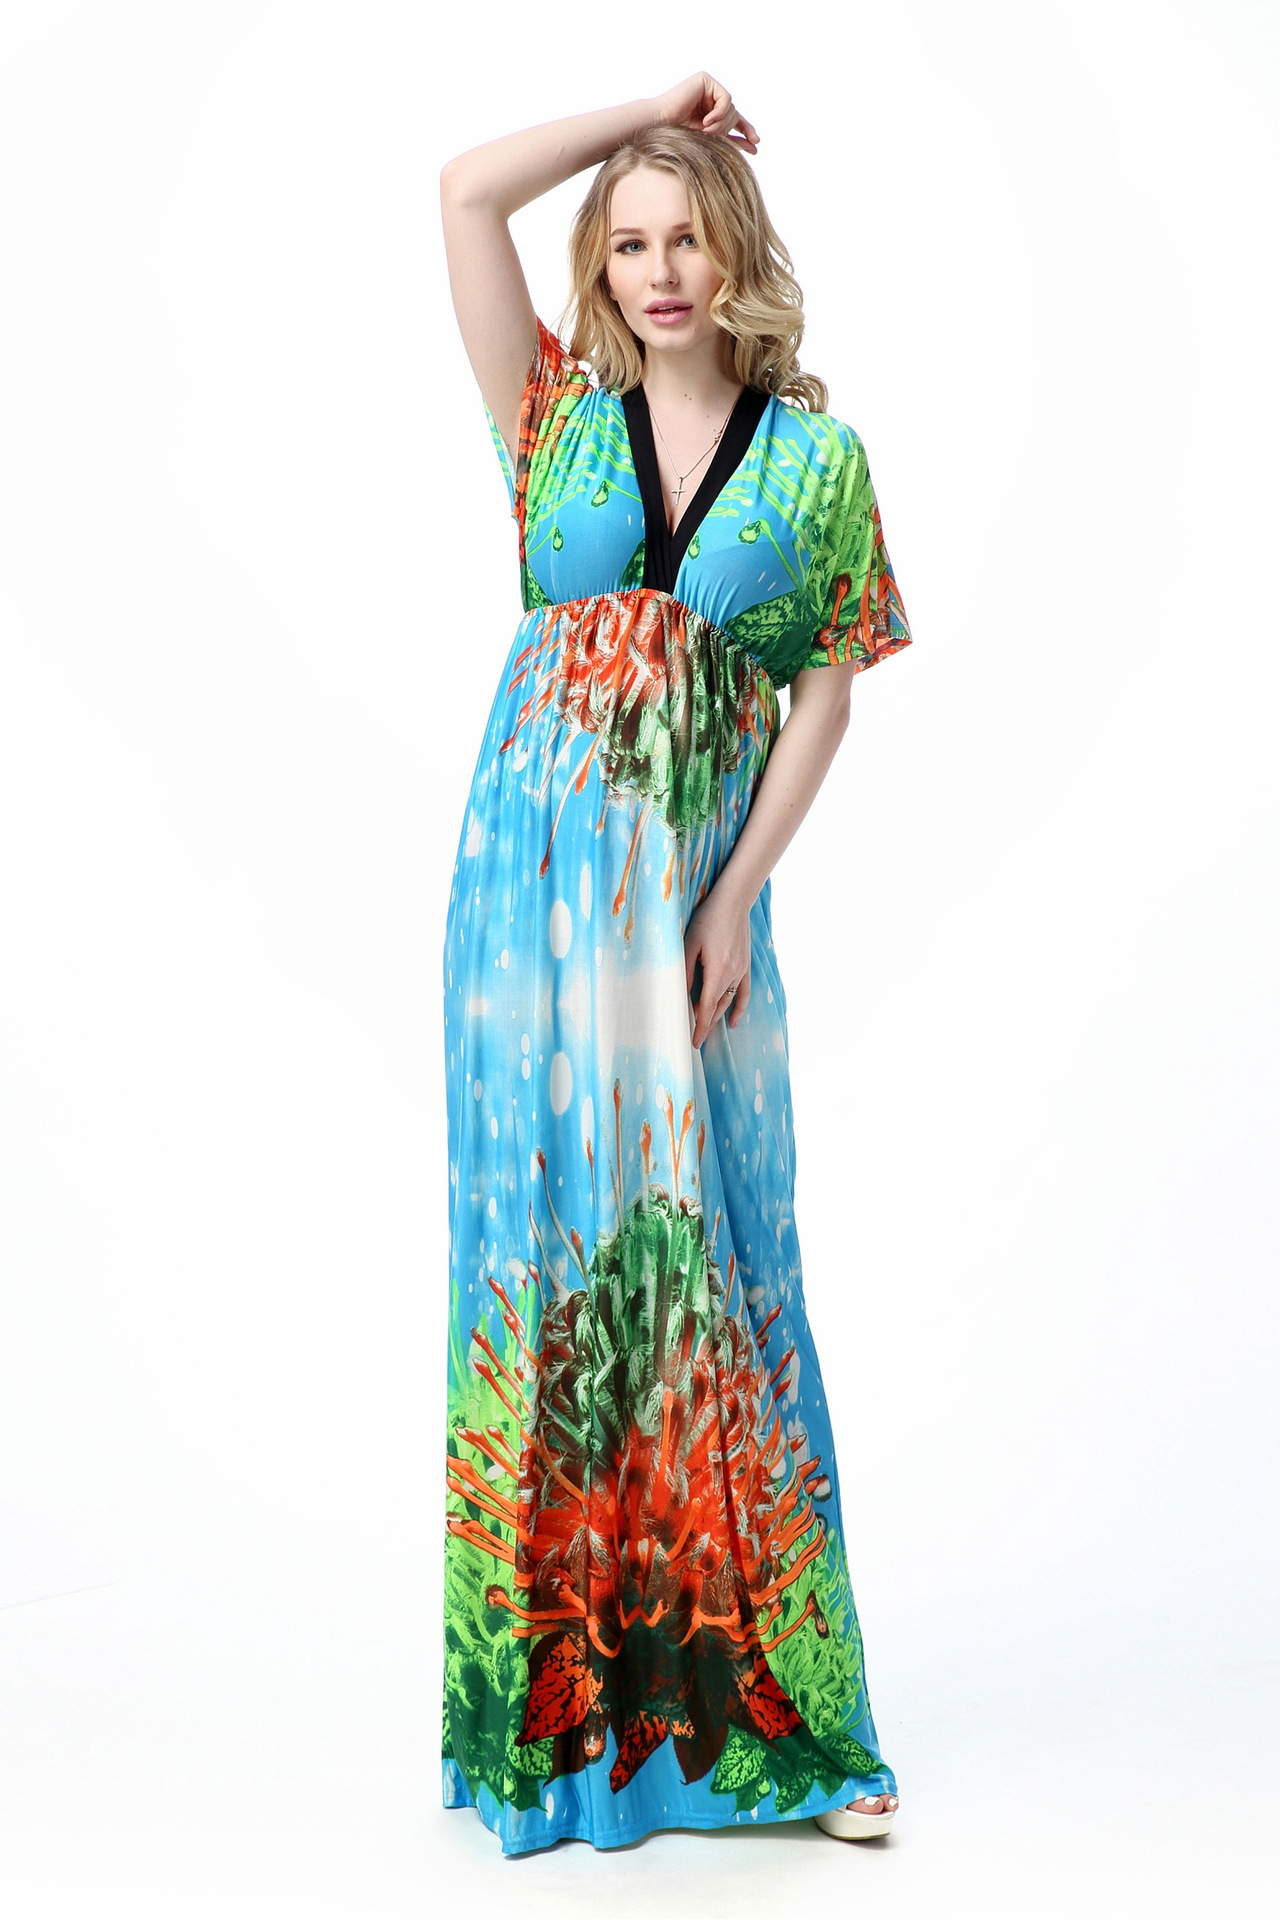 5a94803802c86 Worldwide delivery big size 6xl 7xl women in NaBaRa Online